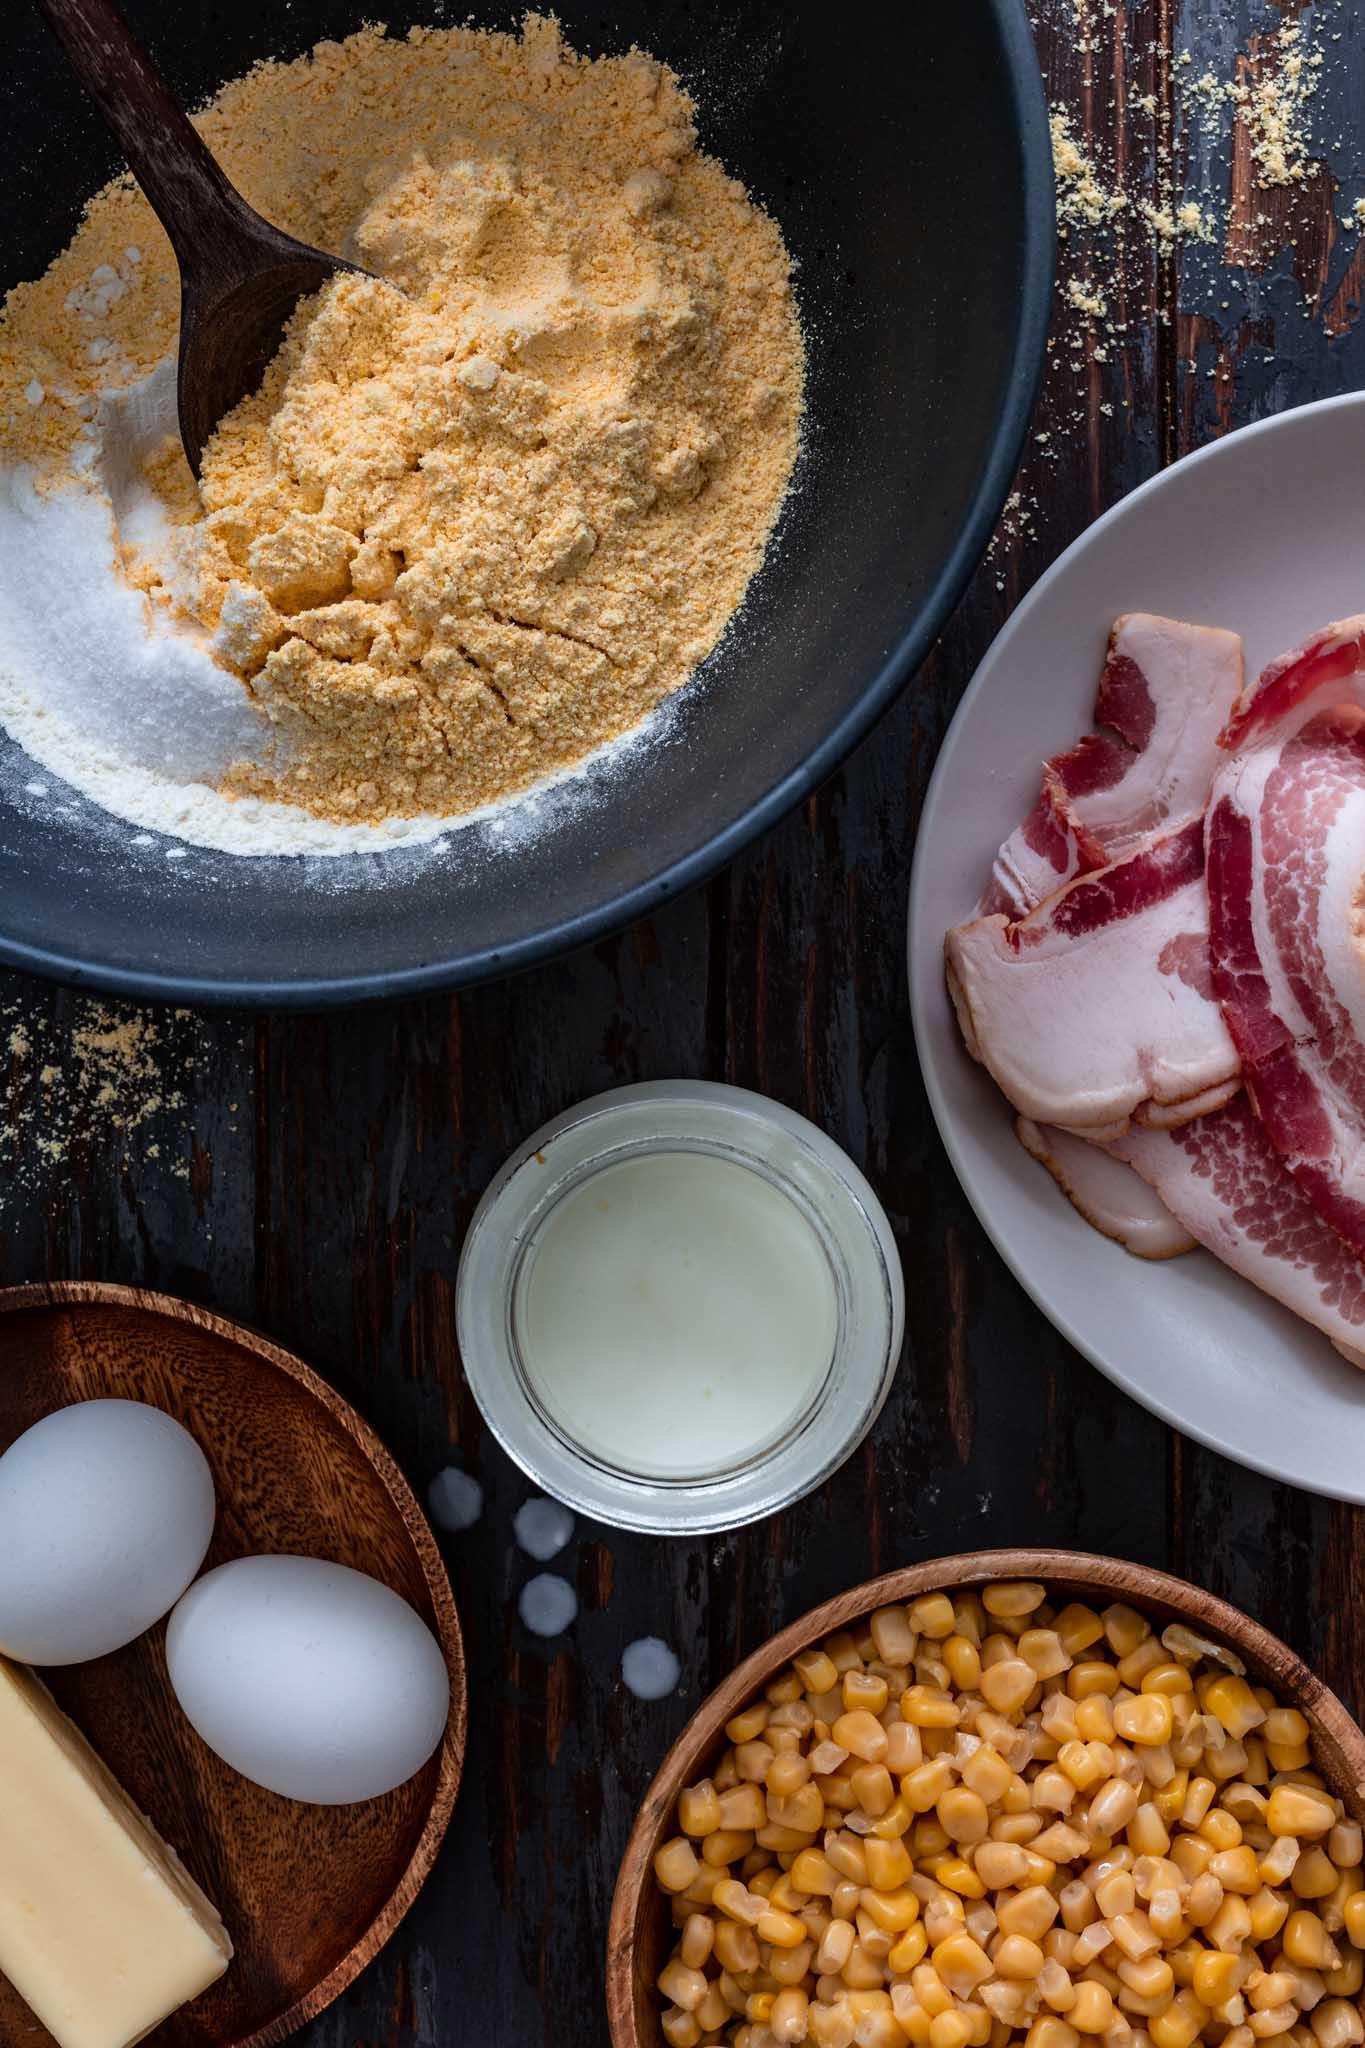 Ingredients to make cornbread